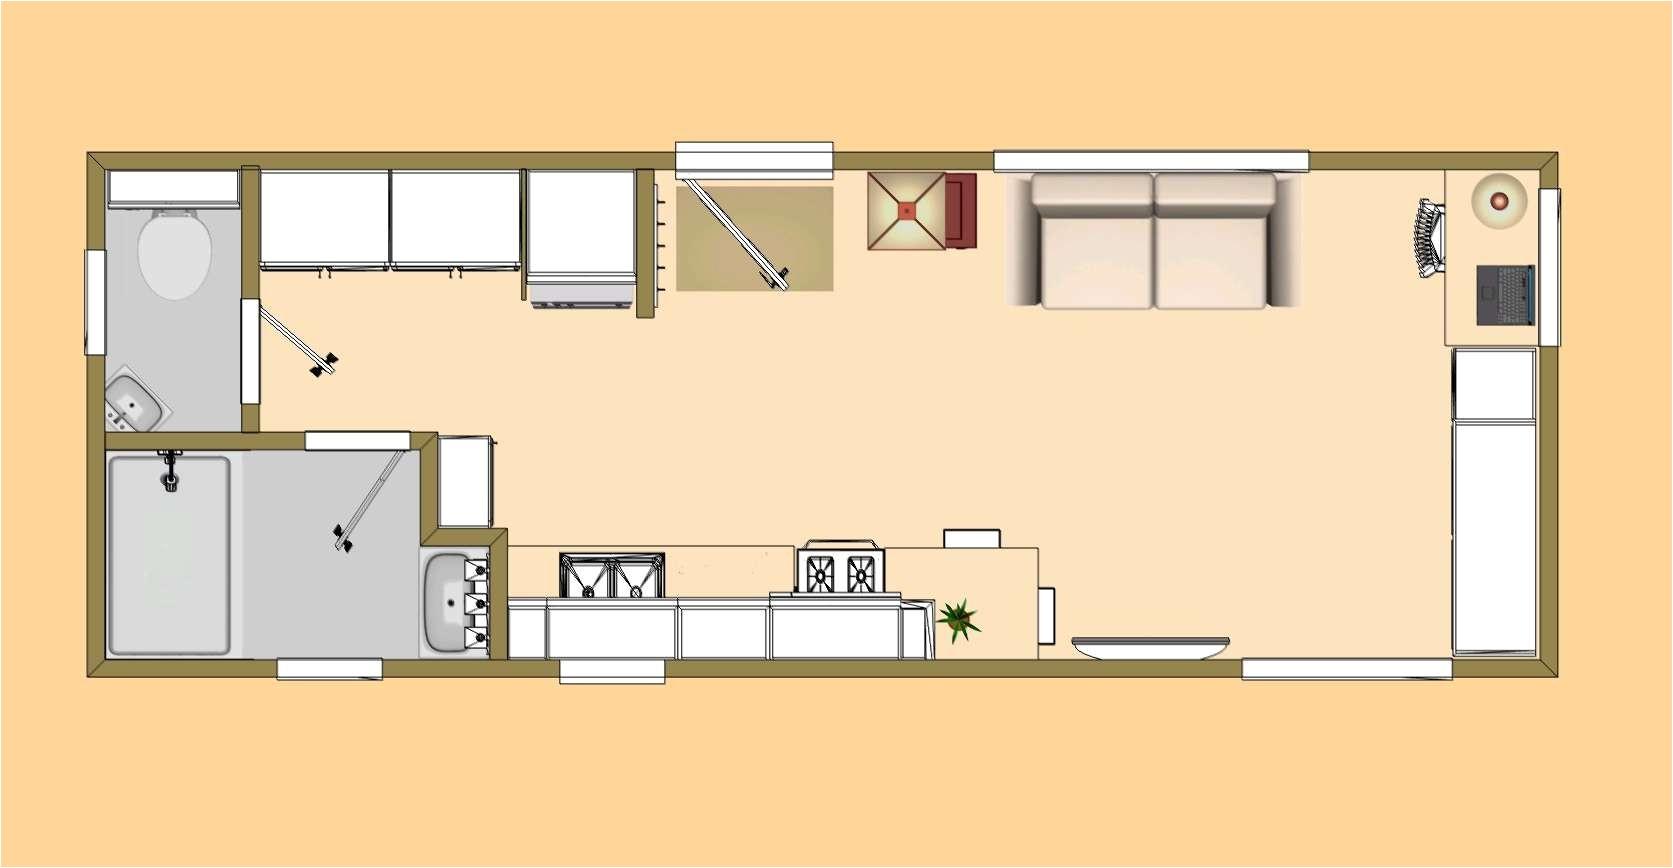 500 square feet house plan home floor plans 500 square feet slyfelinos 2